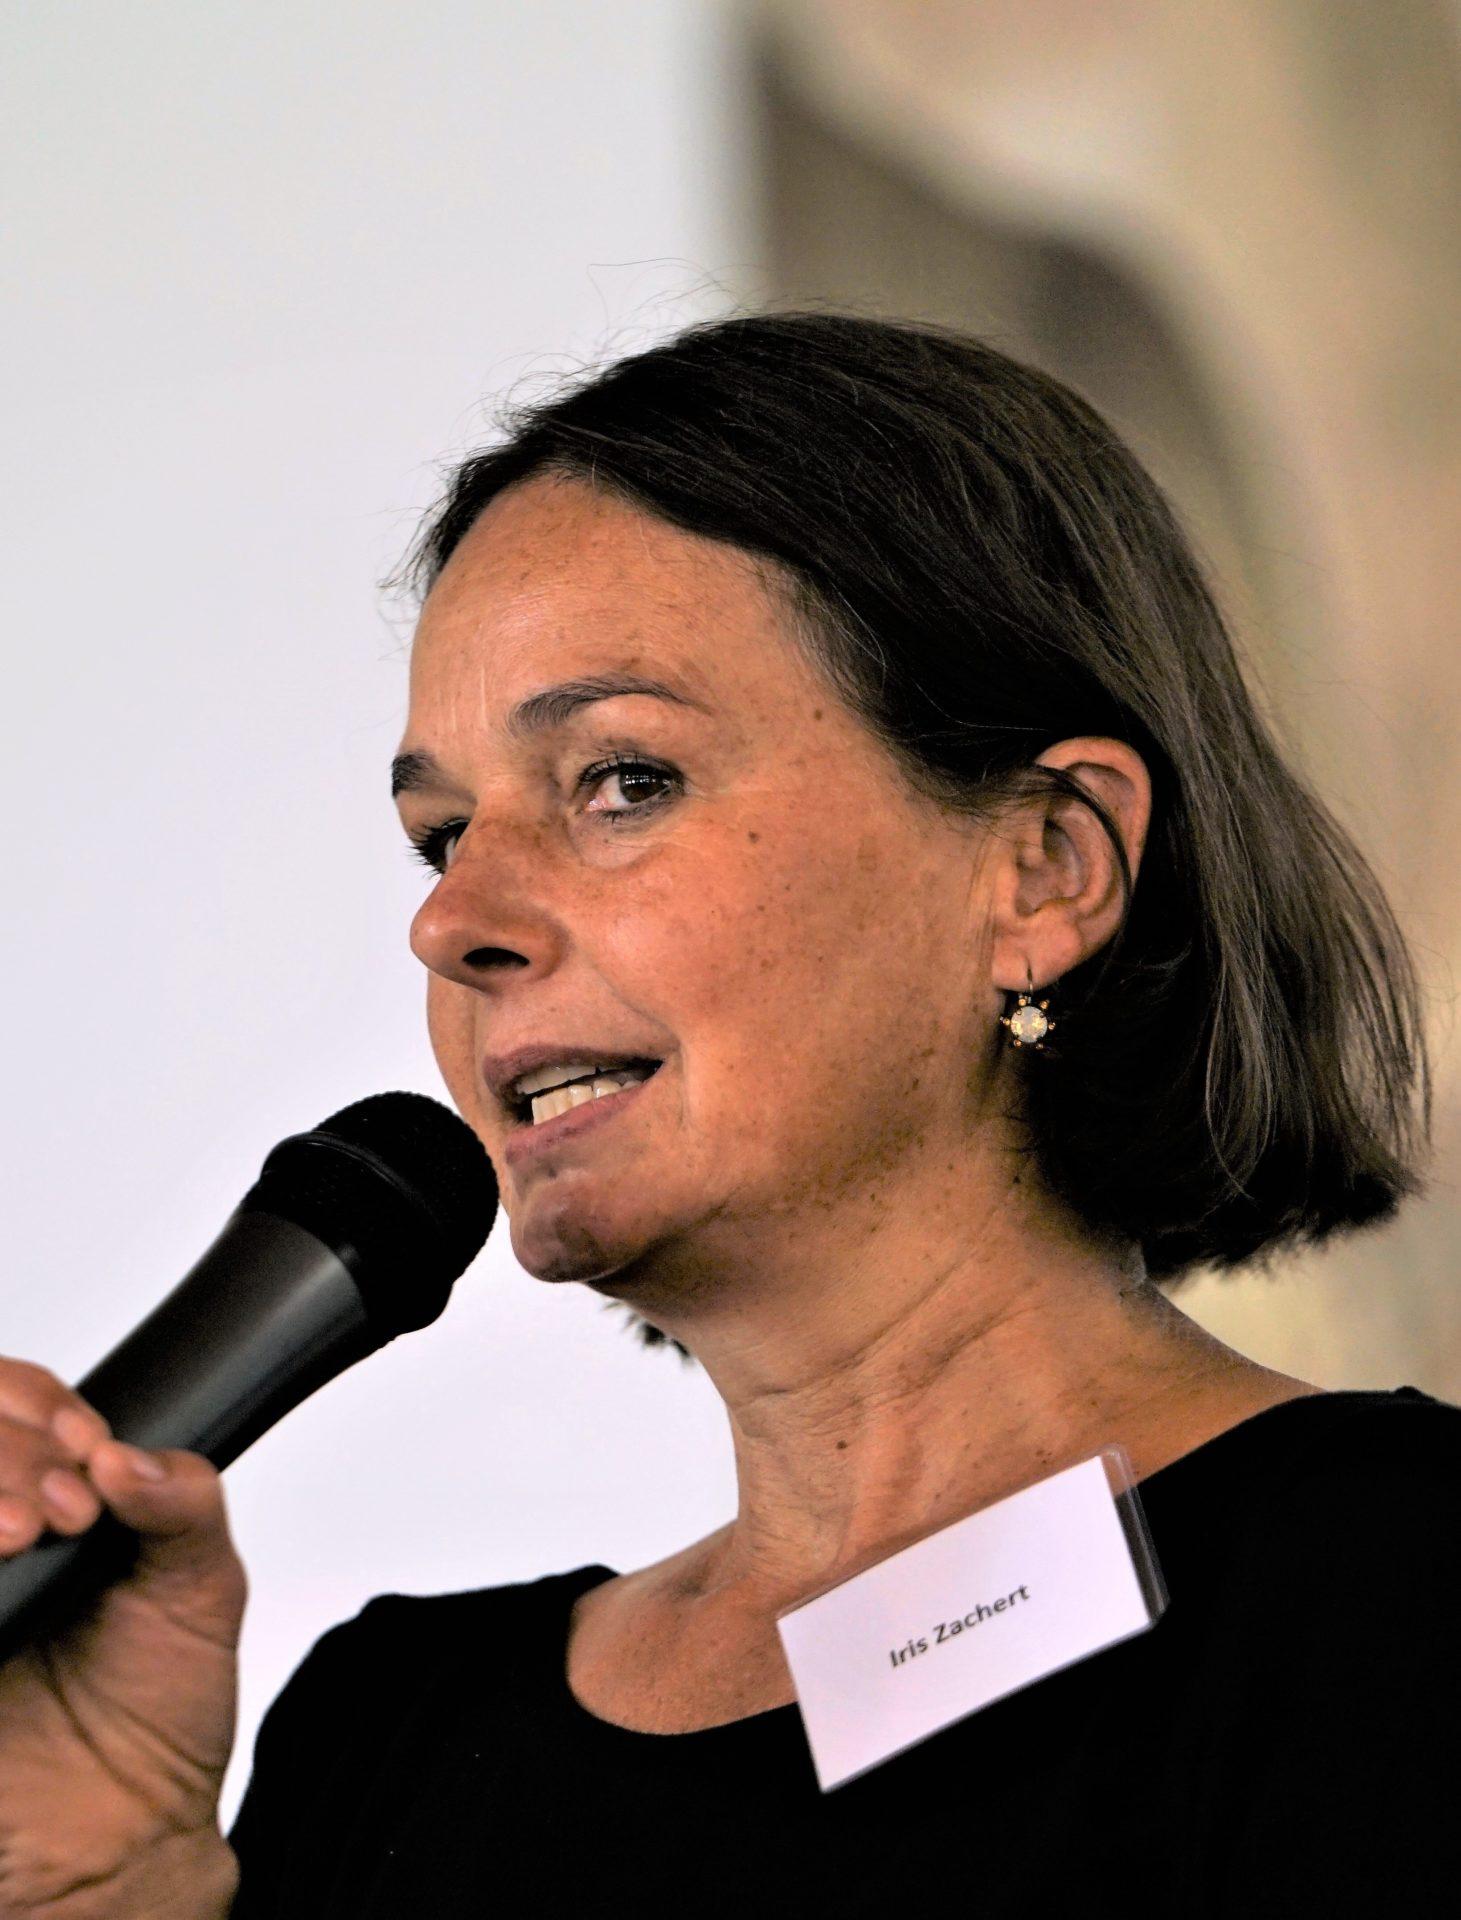 Iris Zachert